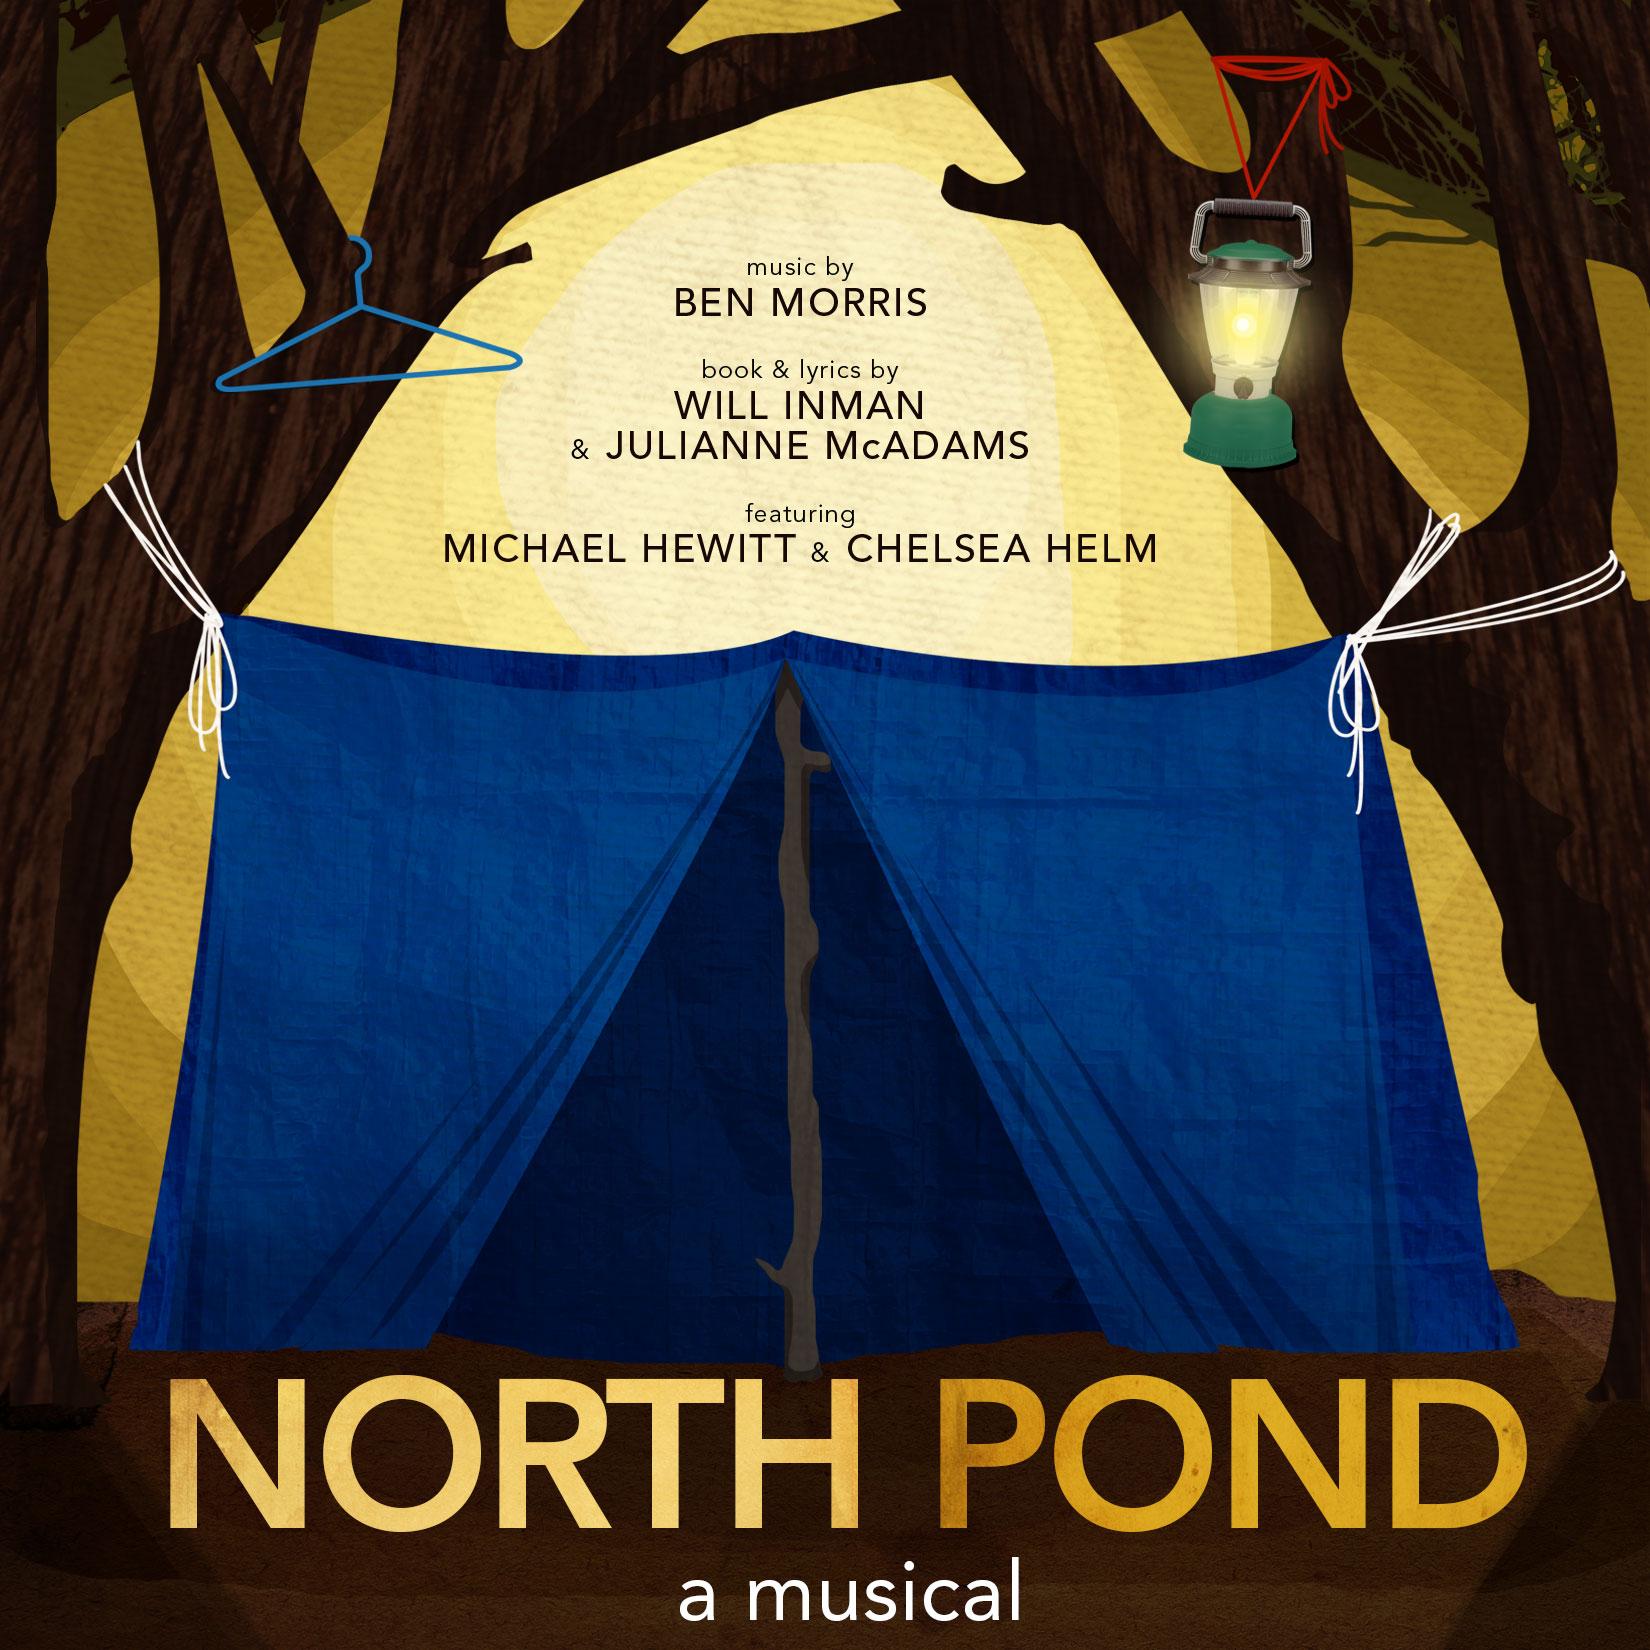 NorthPond_Album-Cover-Square-noDarian.jpg